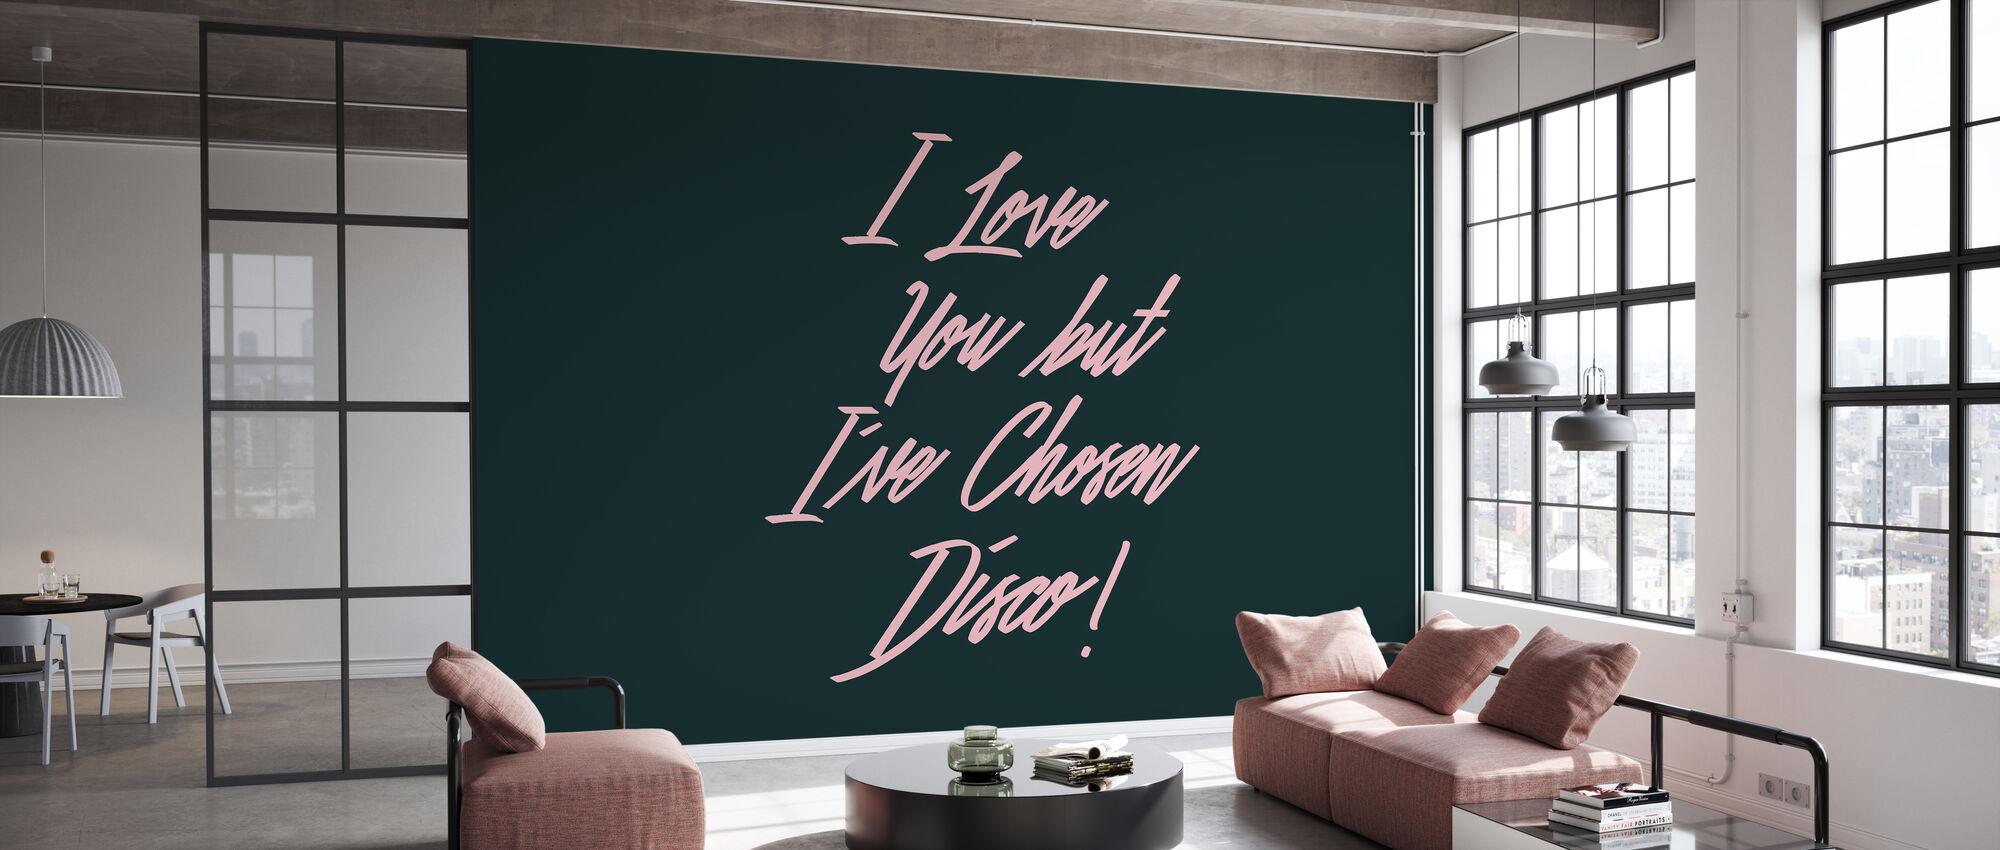 Disco - Wallpaper - Office